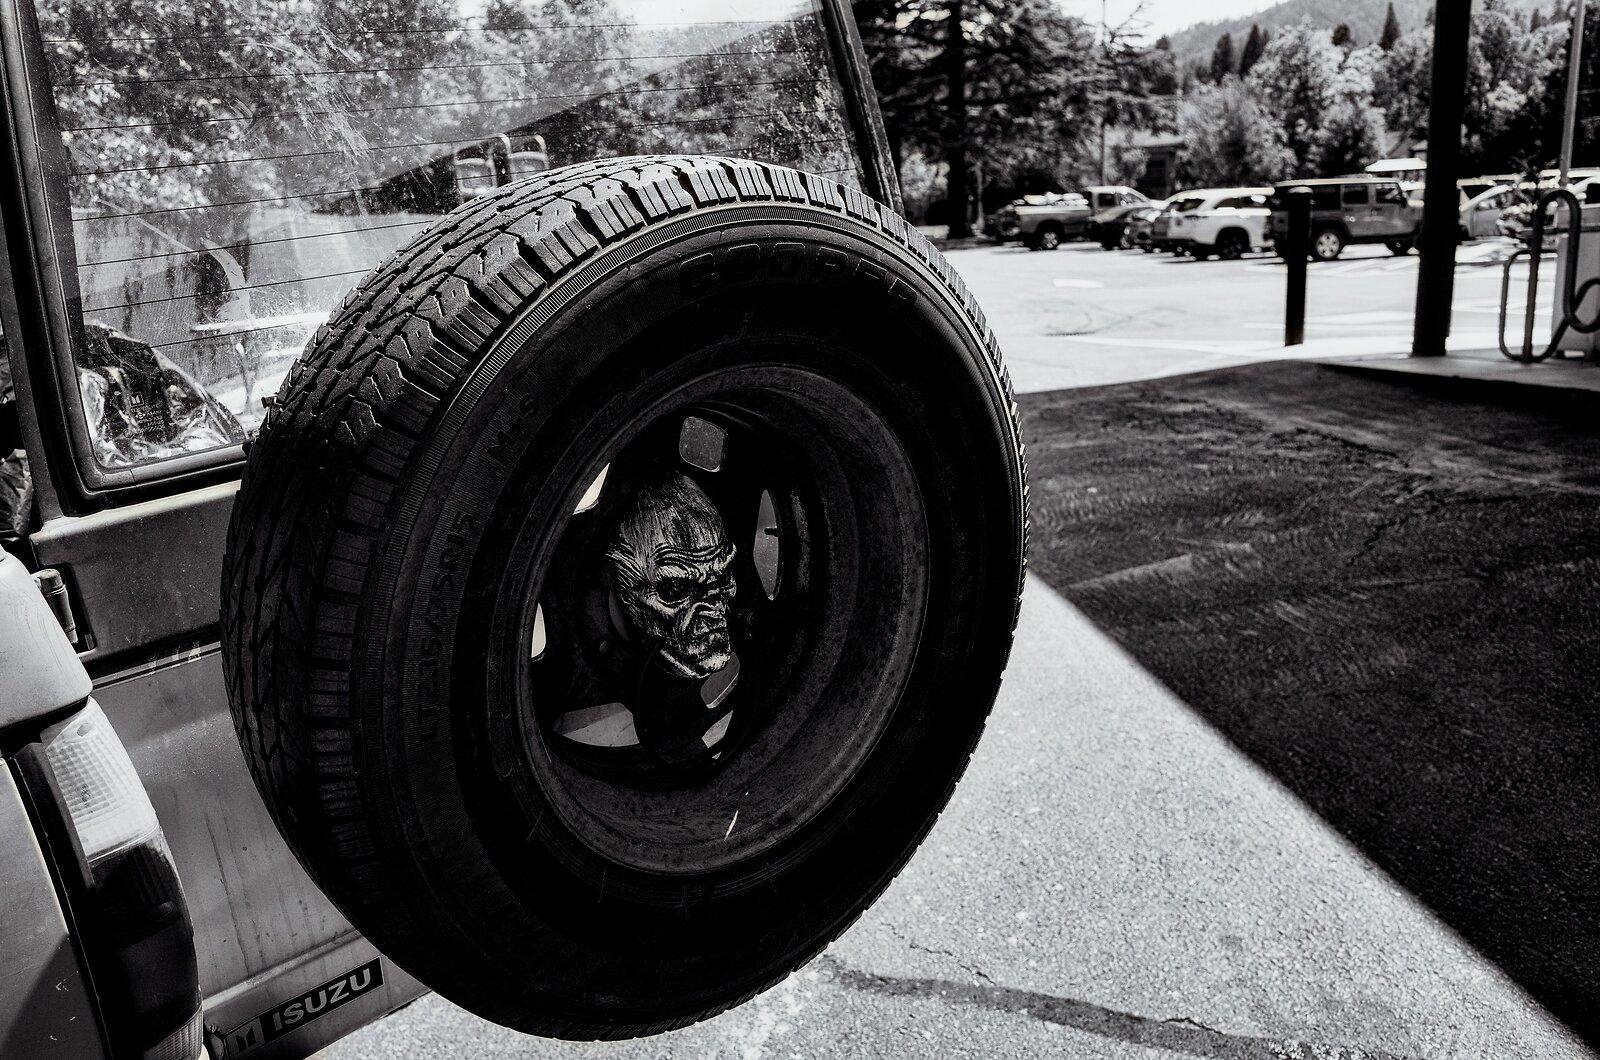 GRII_July6_Isuzu_tire(SilverEfex).jpg